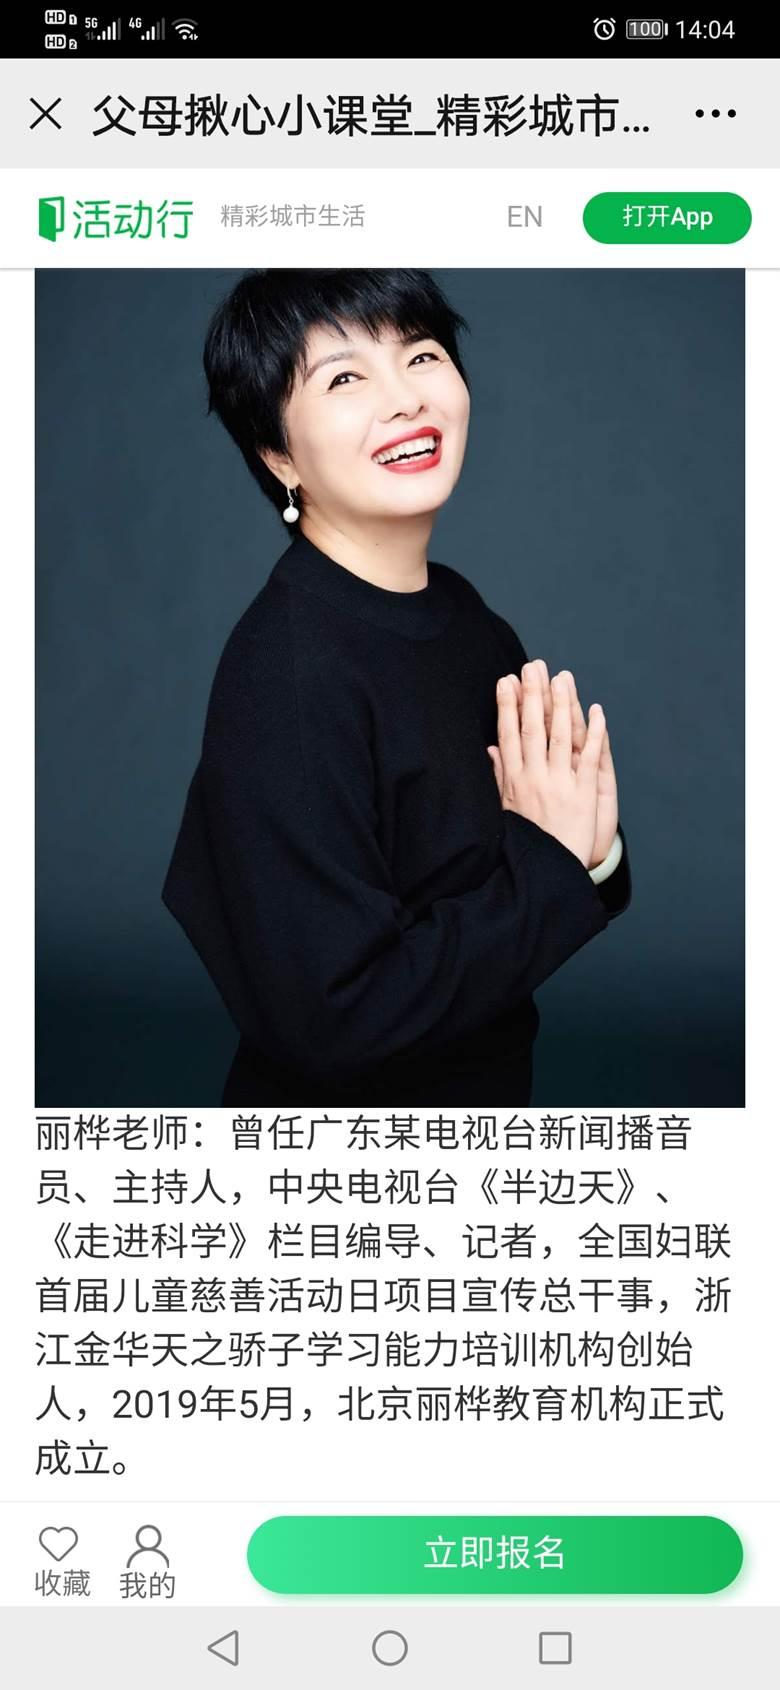 http://www.huodongxing.com/file/20150308/5181892269738/123957292928400.jpg